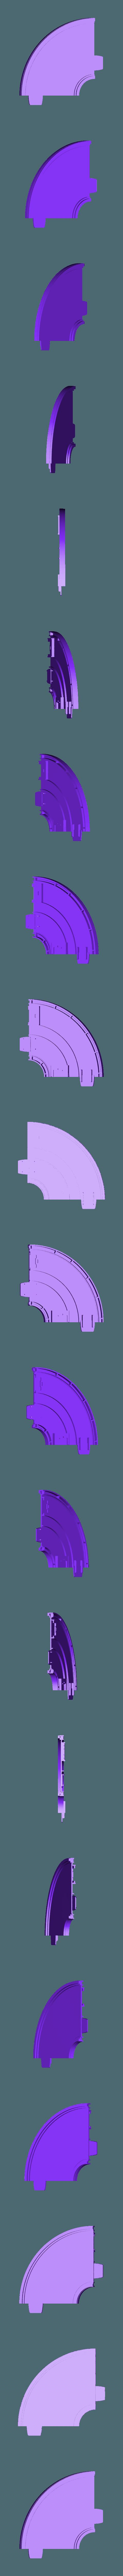 Racetrack_Curved.stl Download free STL file Press Fit Hotwheels Roads • Model to 3D print, sjpiper145